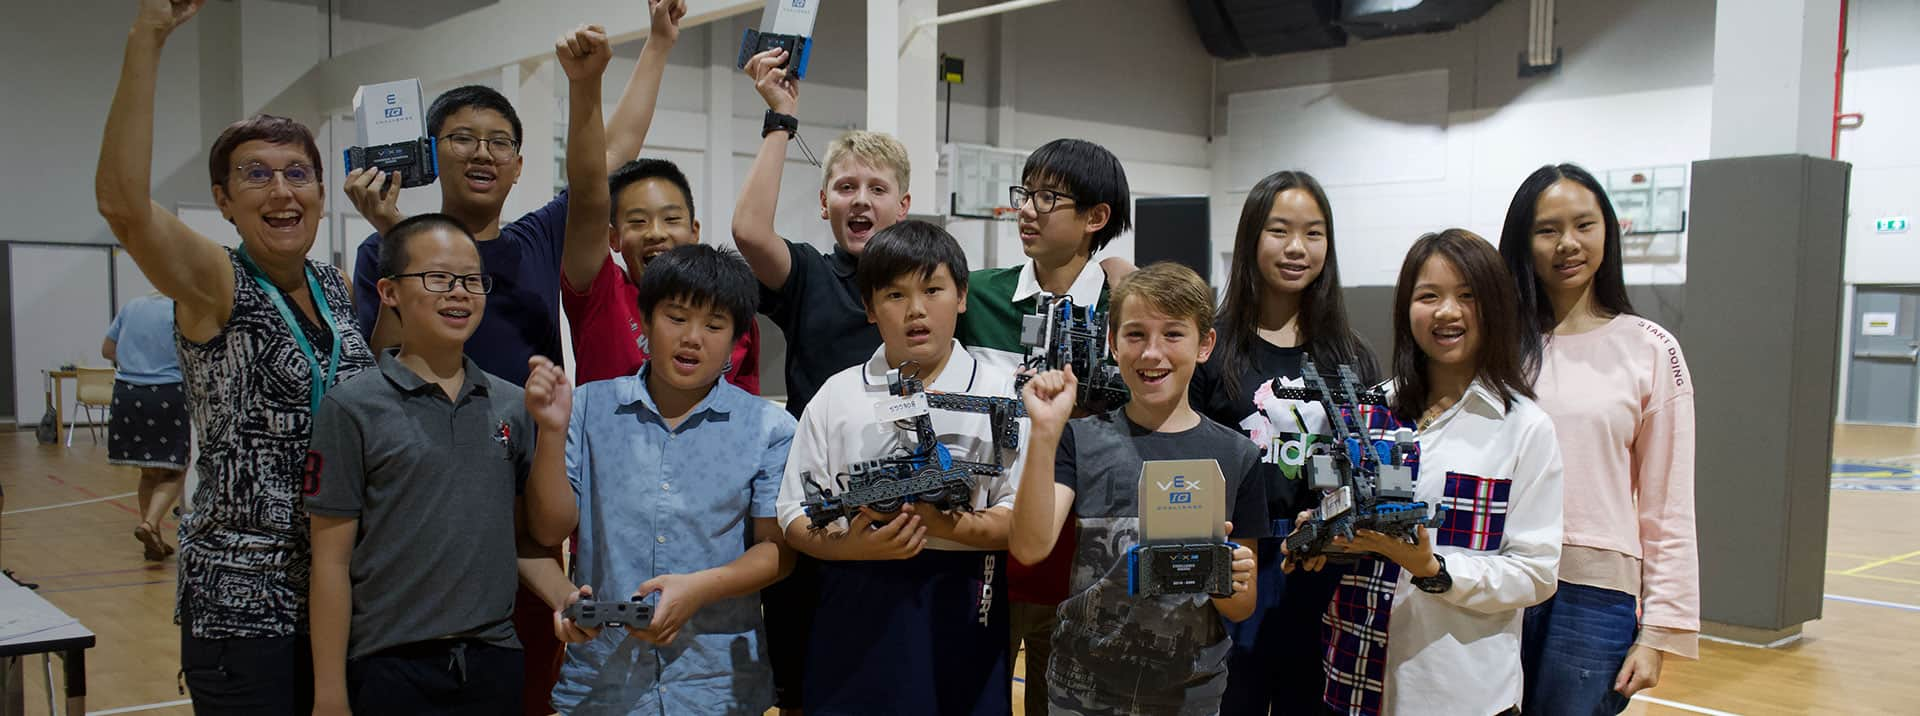 "DBS Denla British School Students Crowned Robotics Champions and Represent Thailand in ""The 2020 VEX Robotics World Championship"" in the USA!"